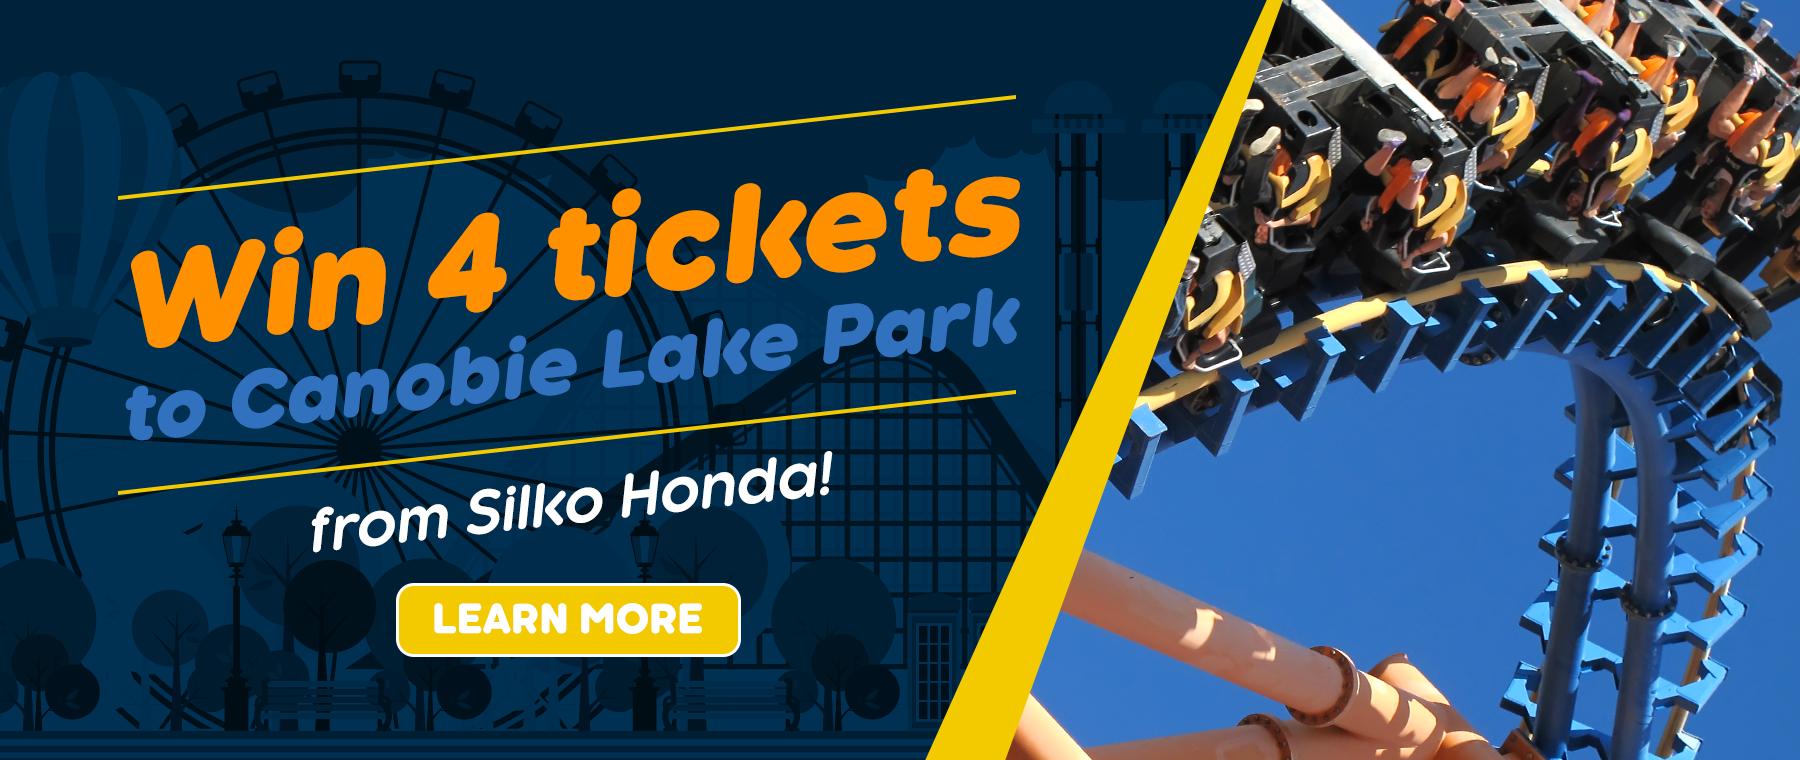 Silko Honda - Win 4 Tickets to Canobie Lake Park